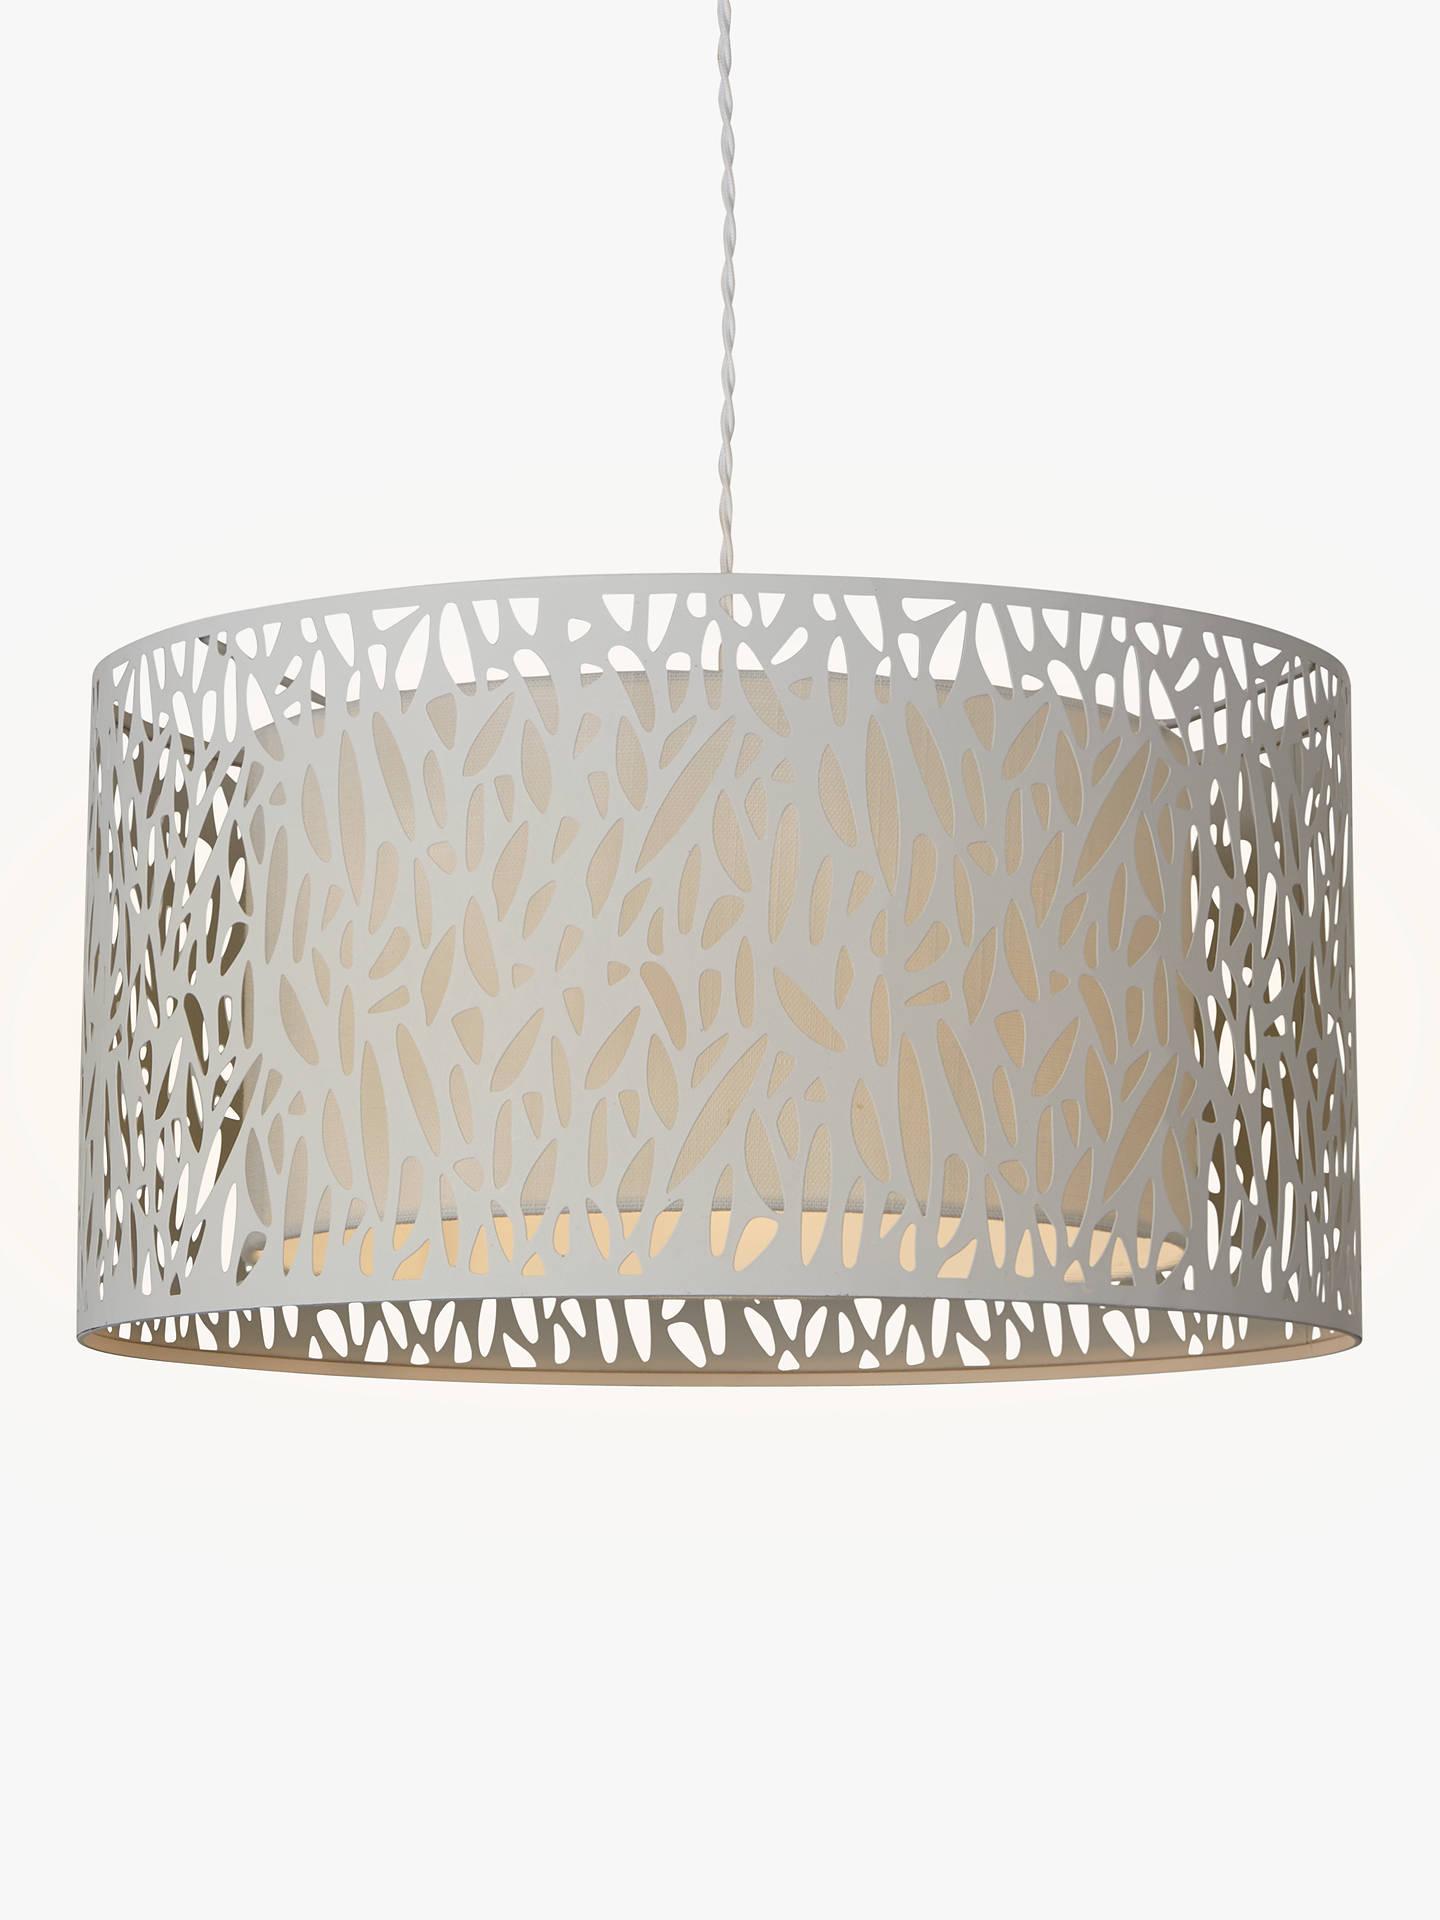 John Lewis Partners Meadow Fretwork Shade Ceiling Light Grey White